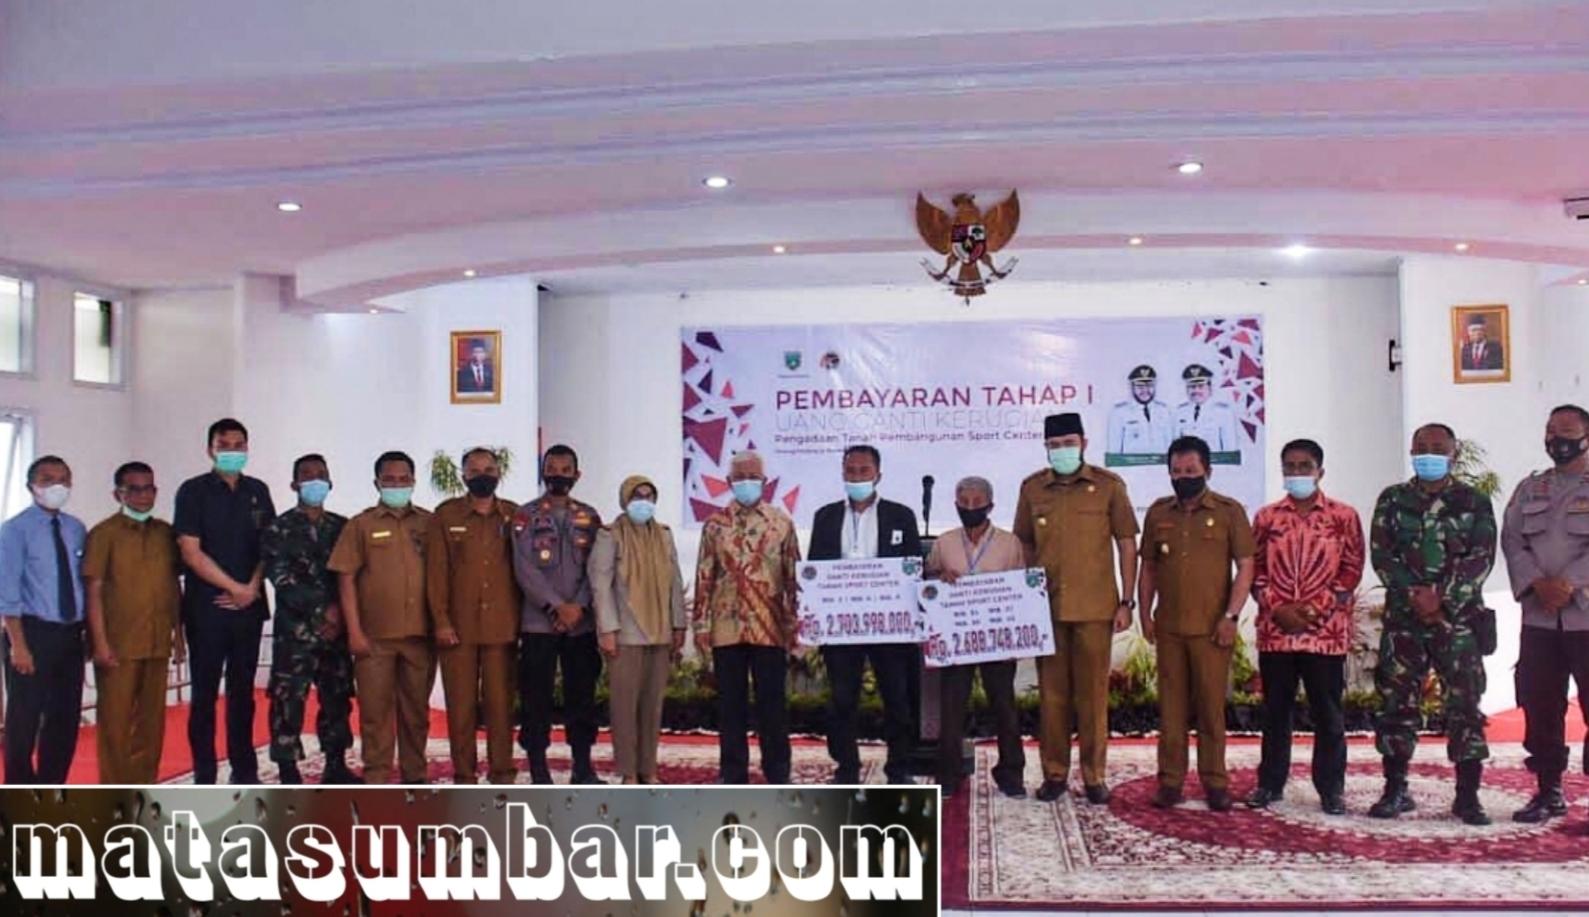 Niniak Mamak Dukung Pembangunan Sport Center, Pemko Bayarkan Ganti Rugi Tahap Pertama